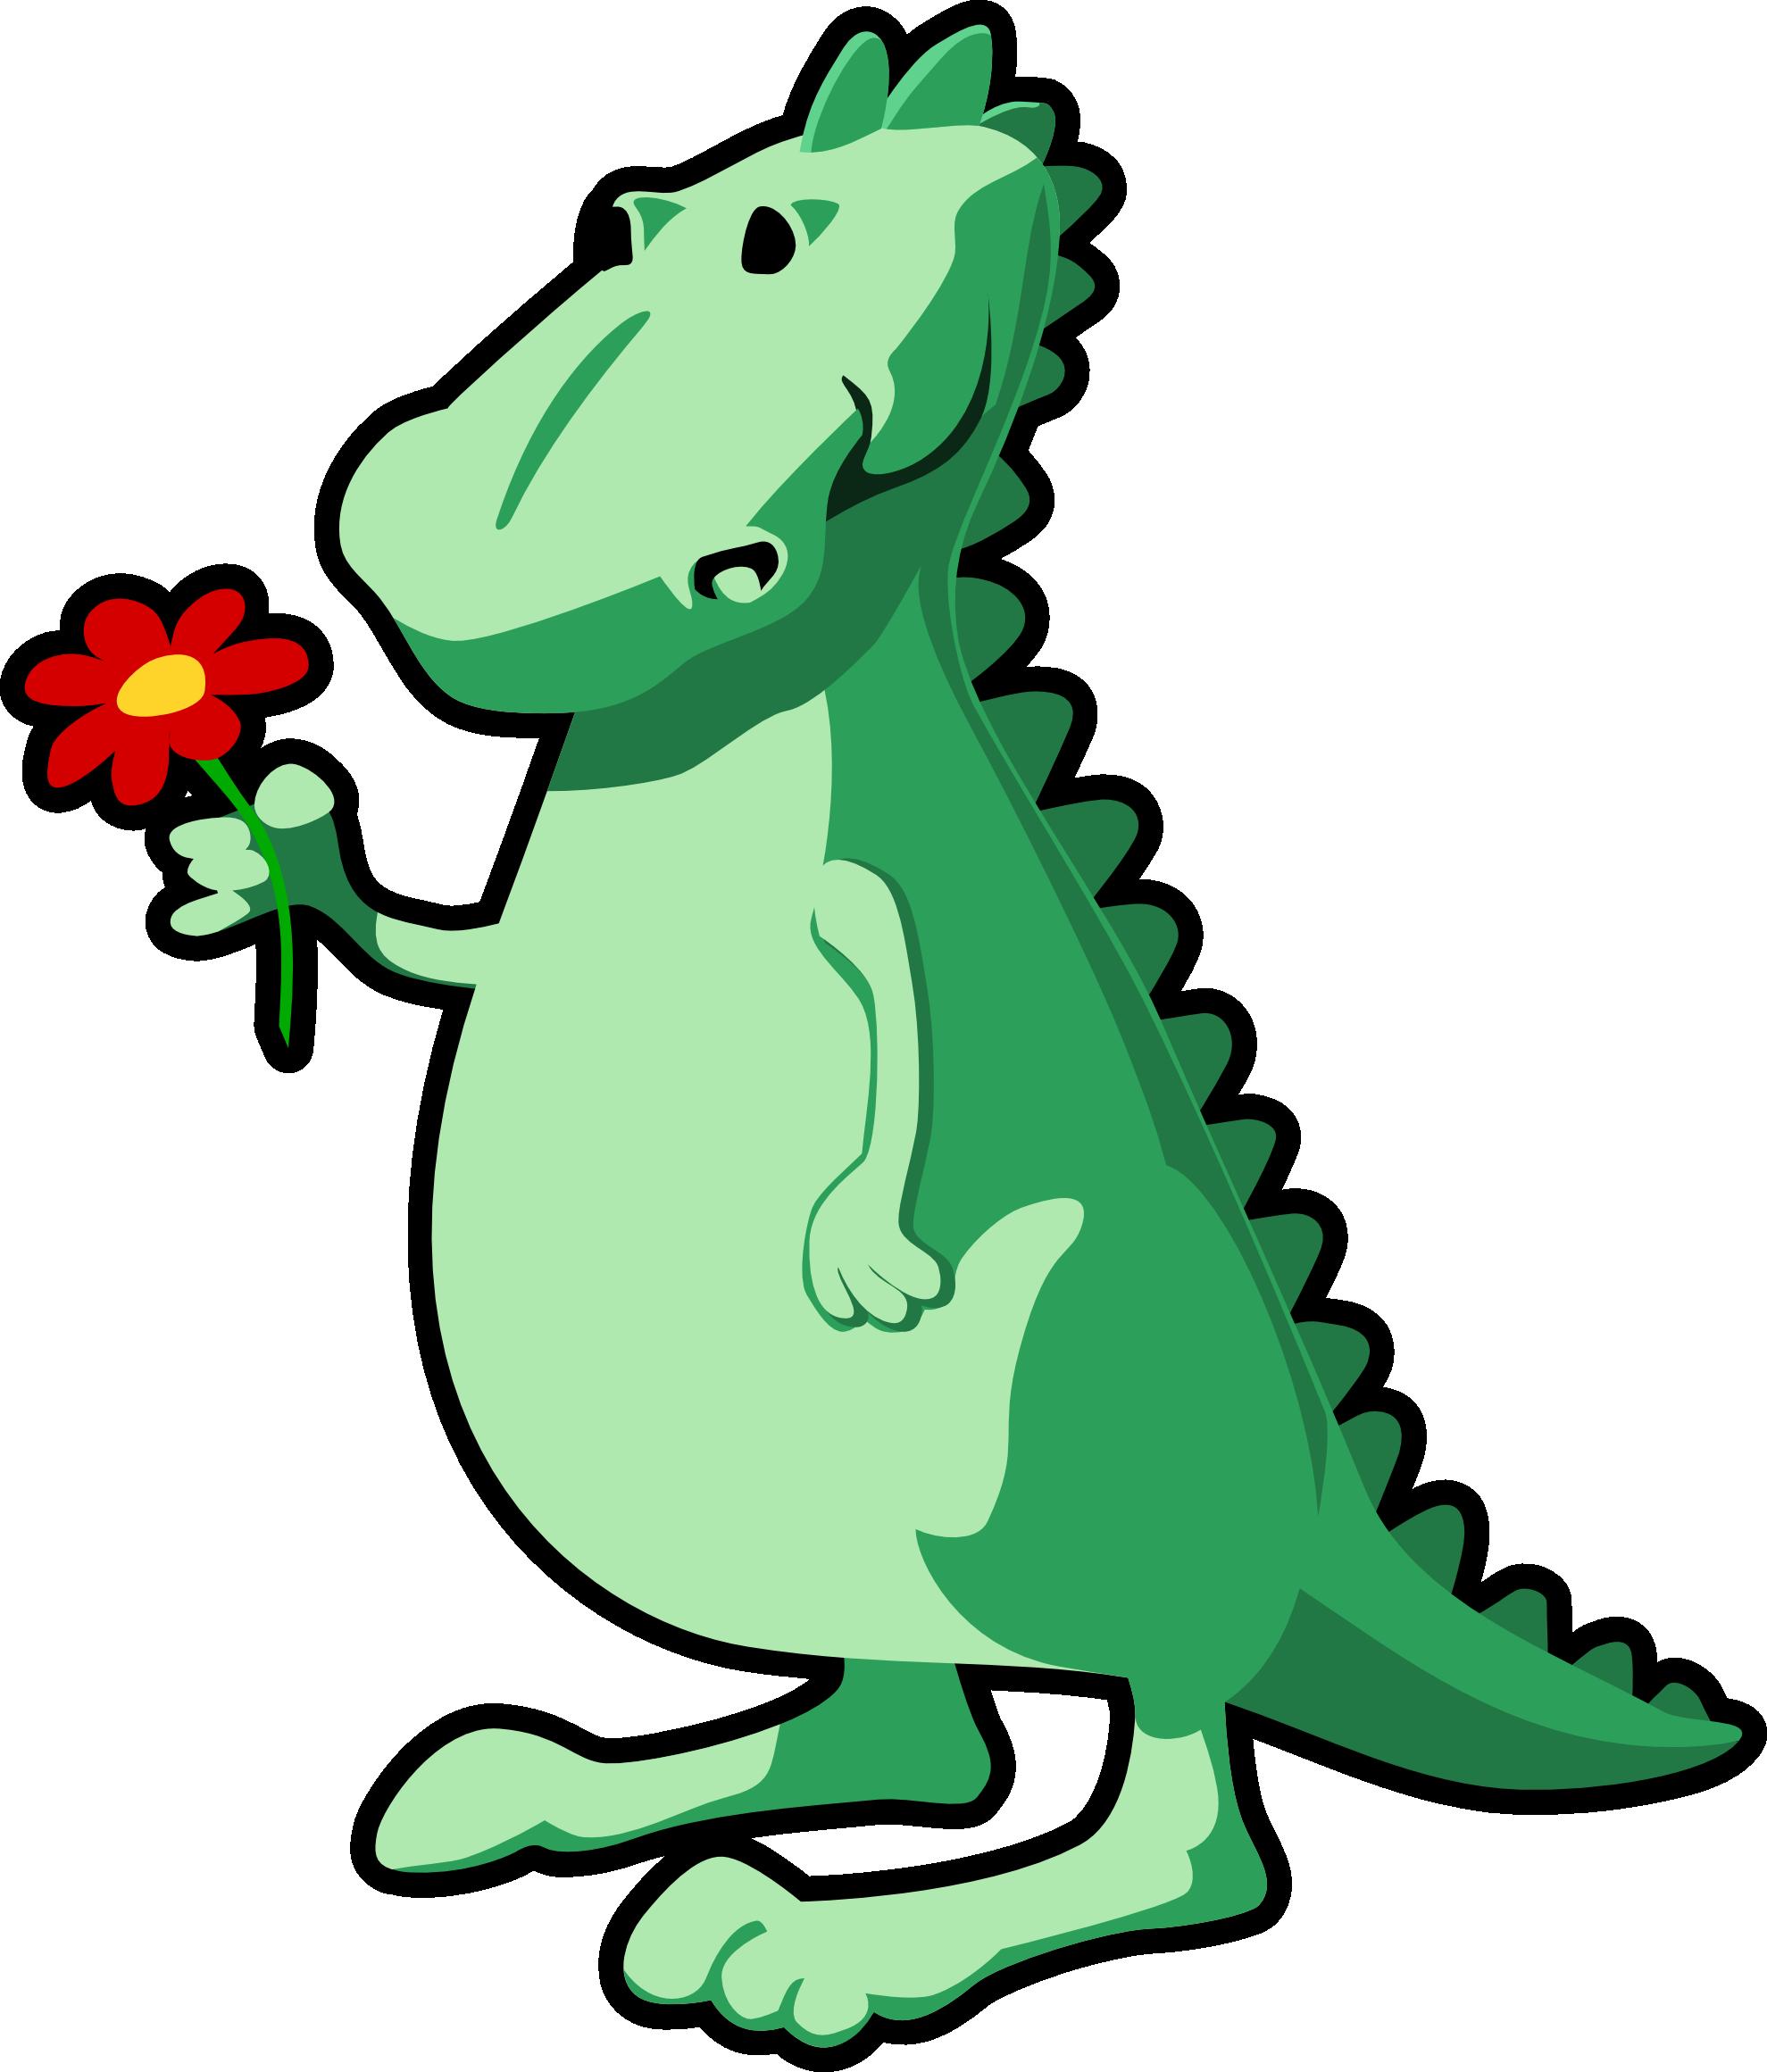 dinosaur%20clipart%20black%20and%20white